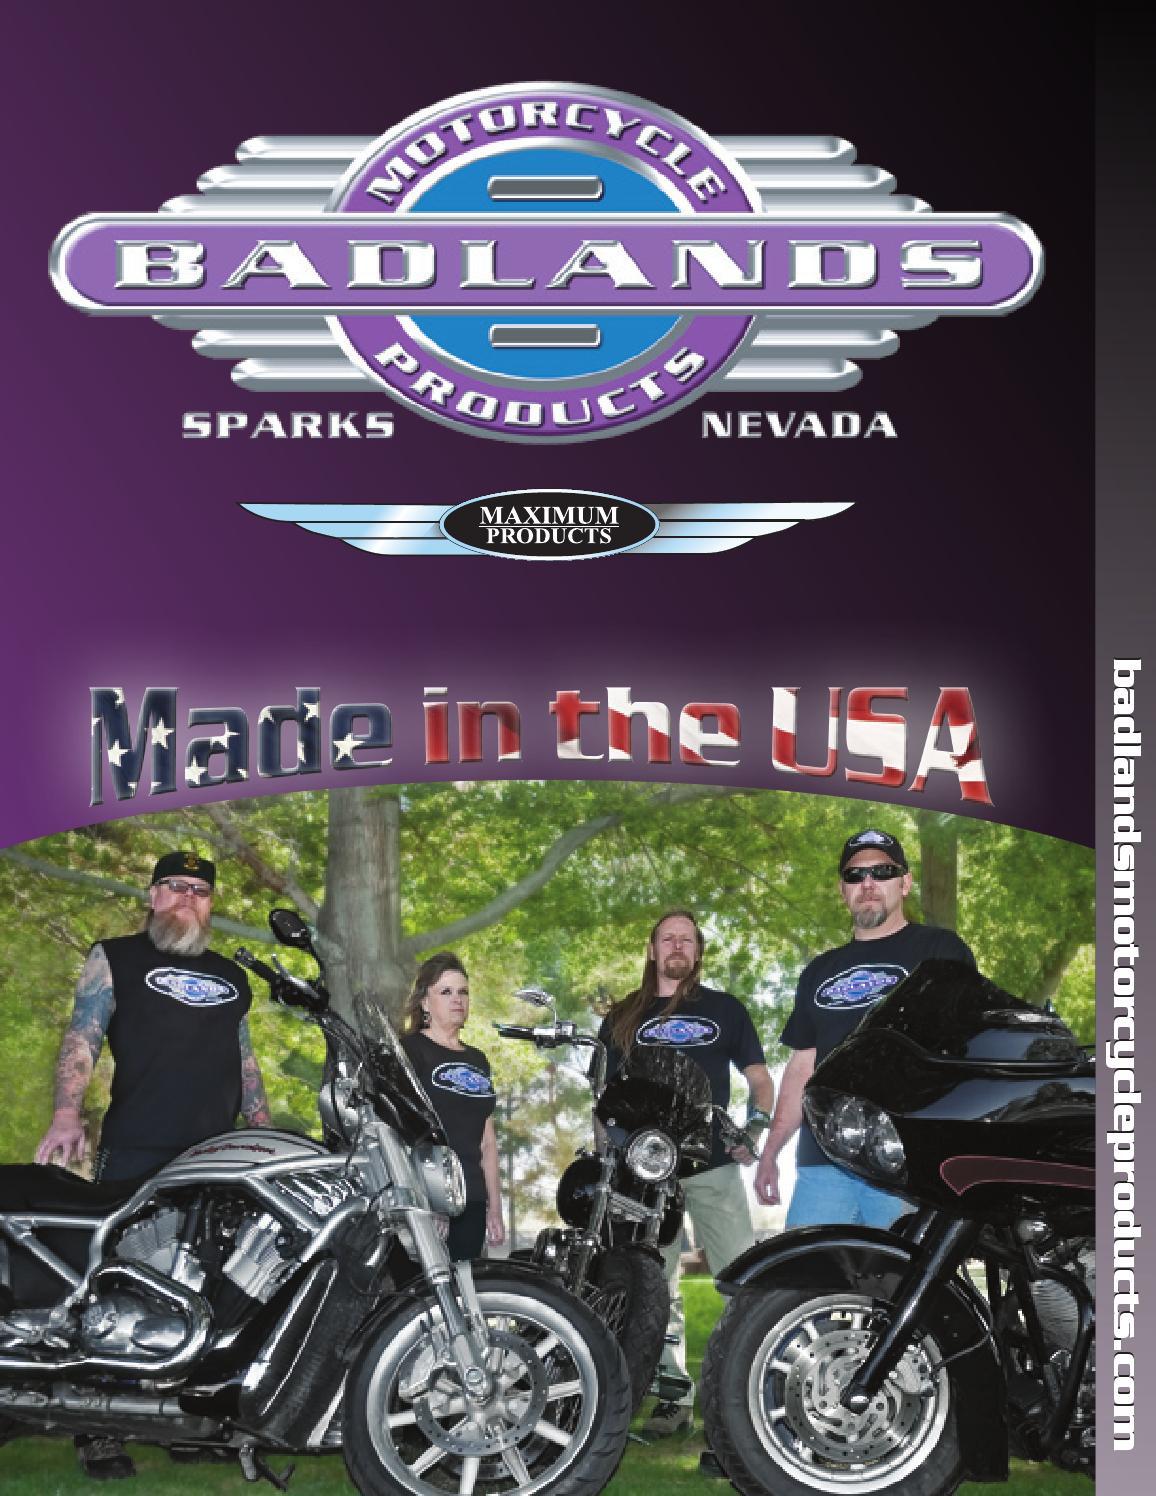 Badlands ATS-03-A Plug In Turn Signal Canceling Module 1987-93 Harley-Davidson